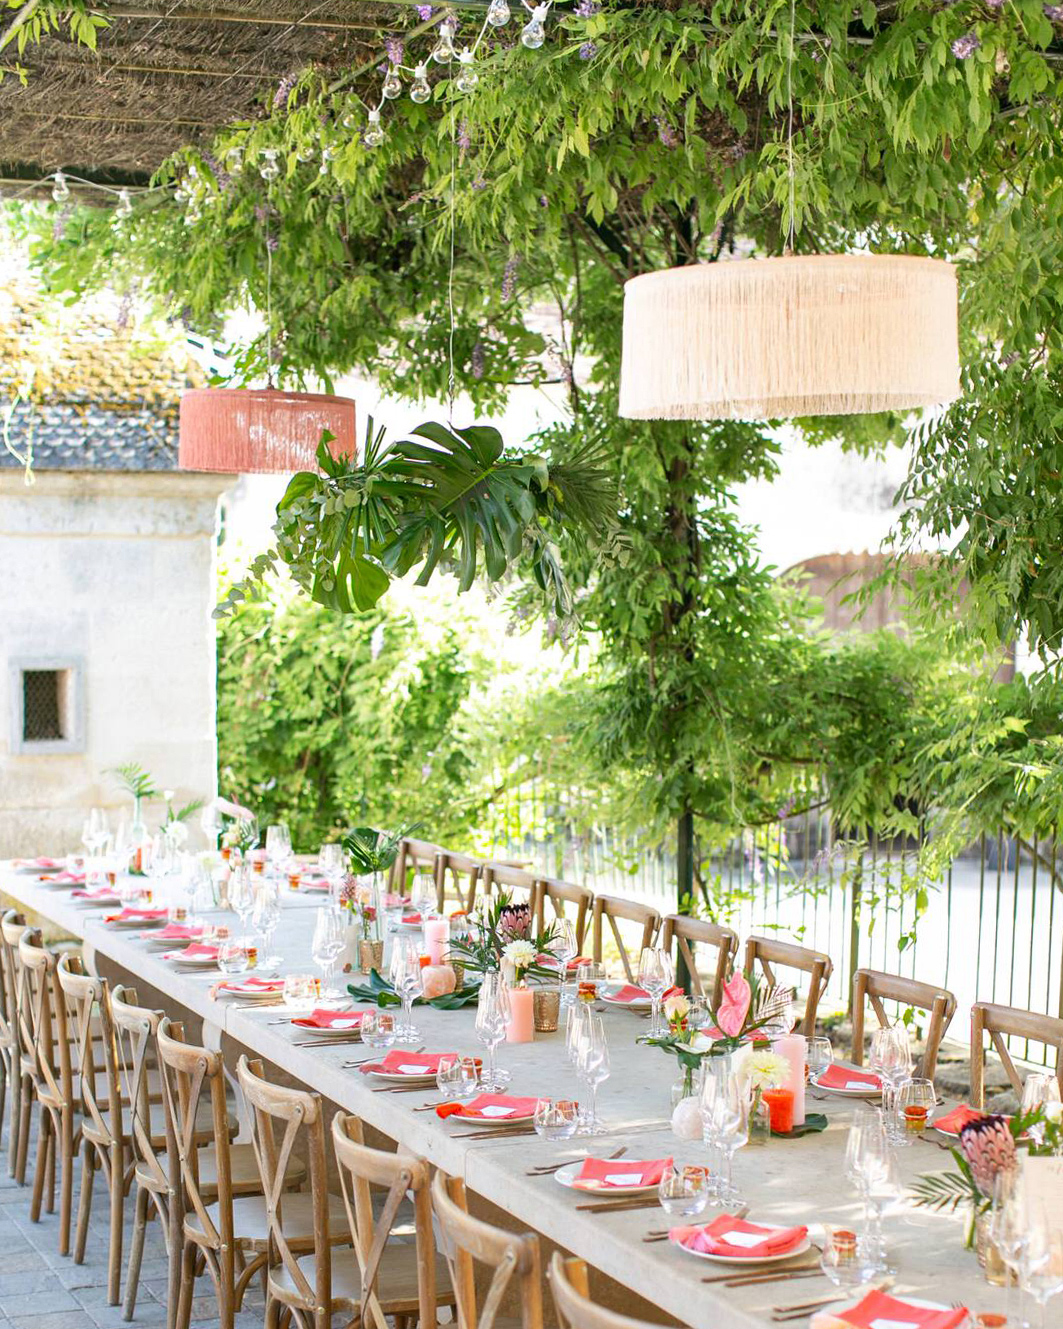 jen tim wedding reception elegant tropical decor on long table